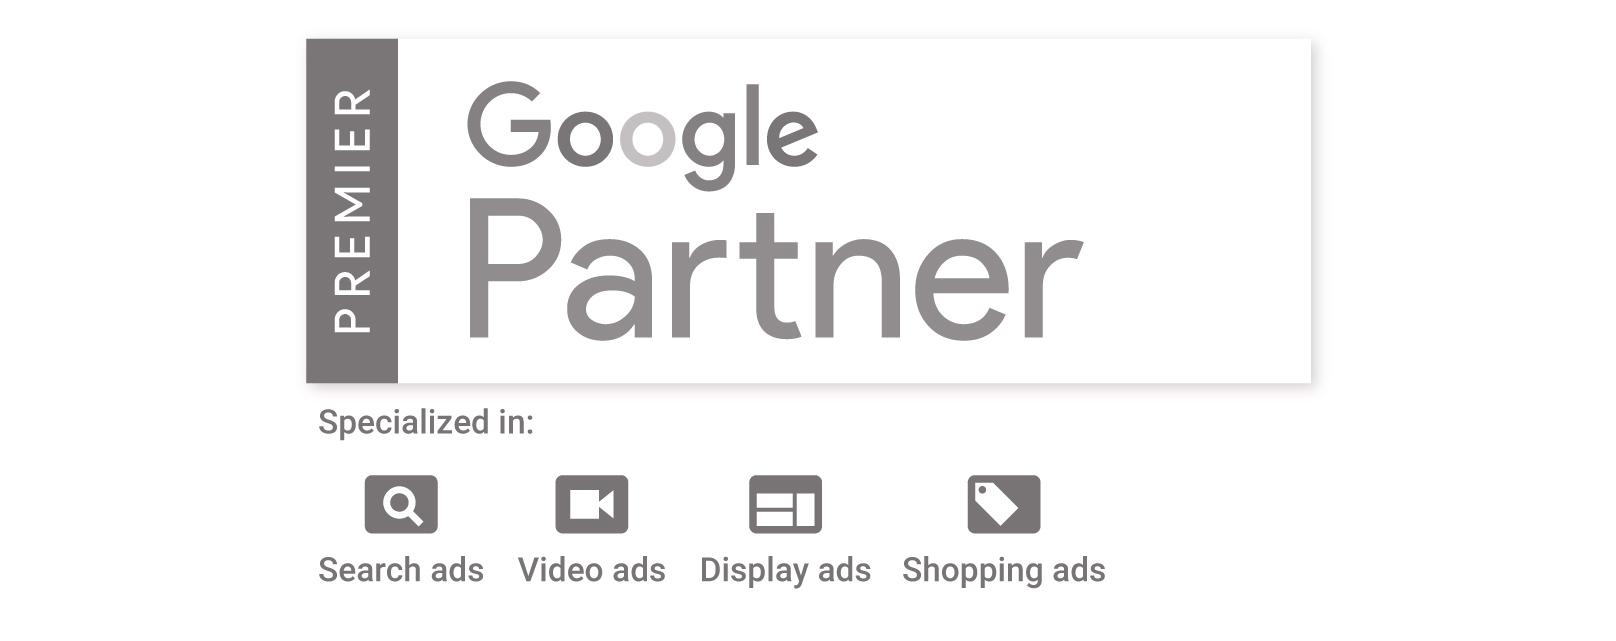 certification-logo-image